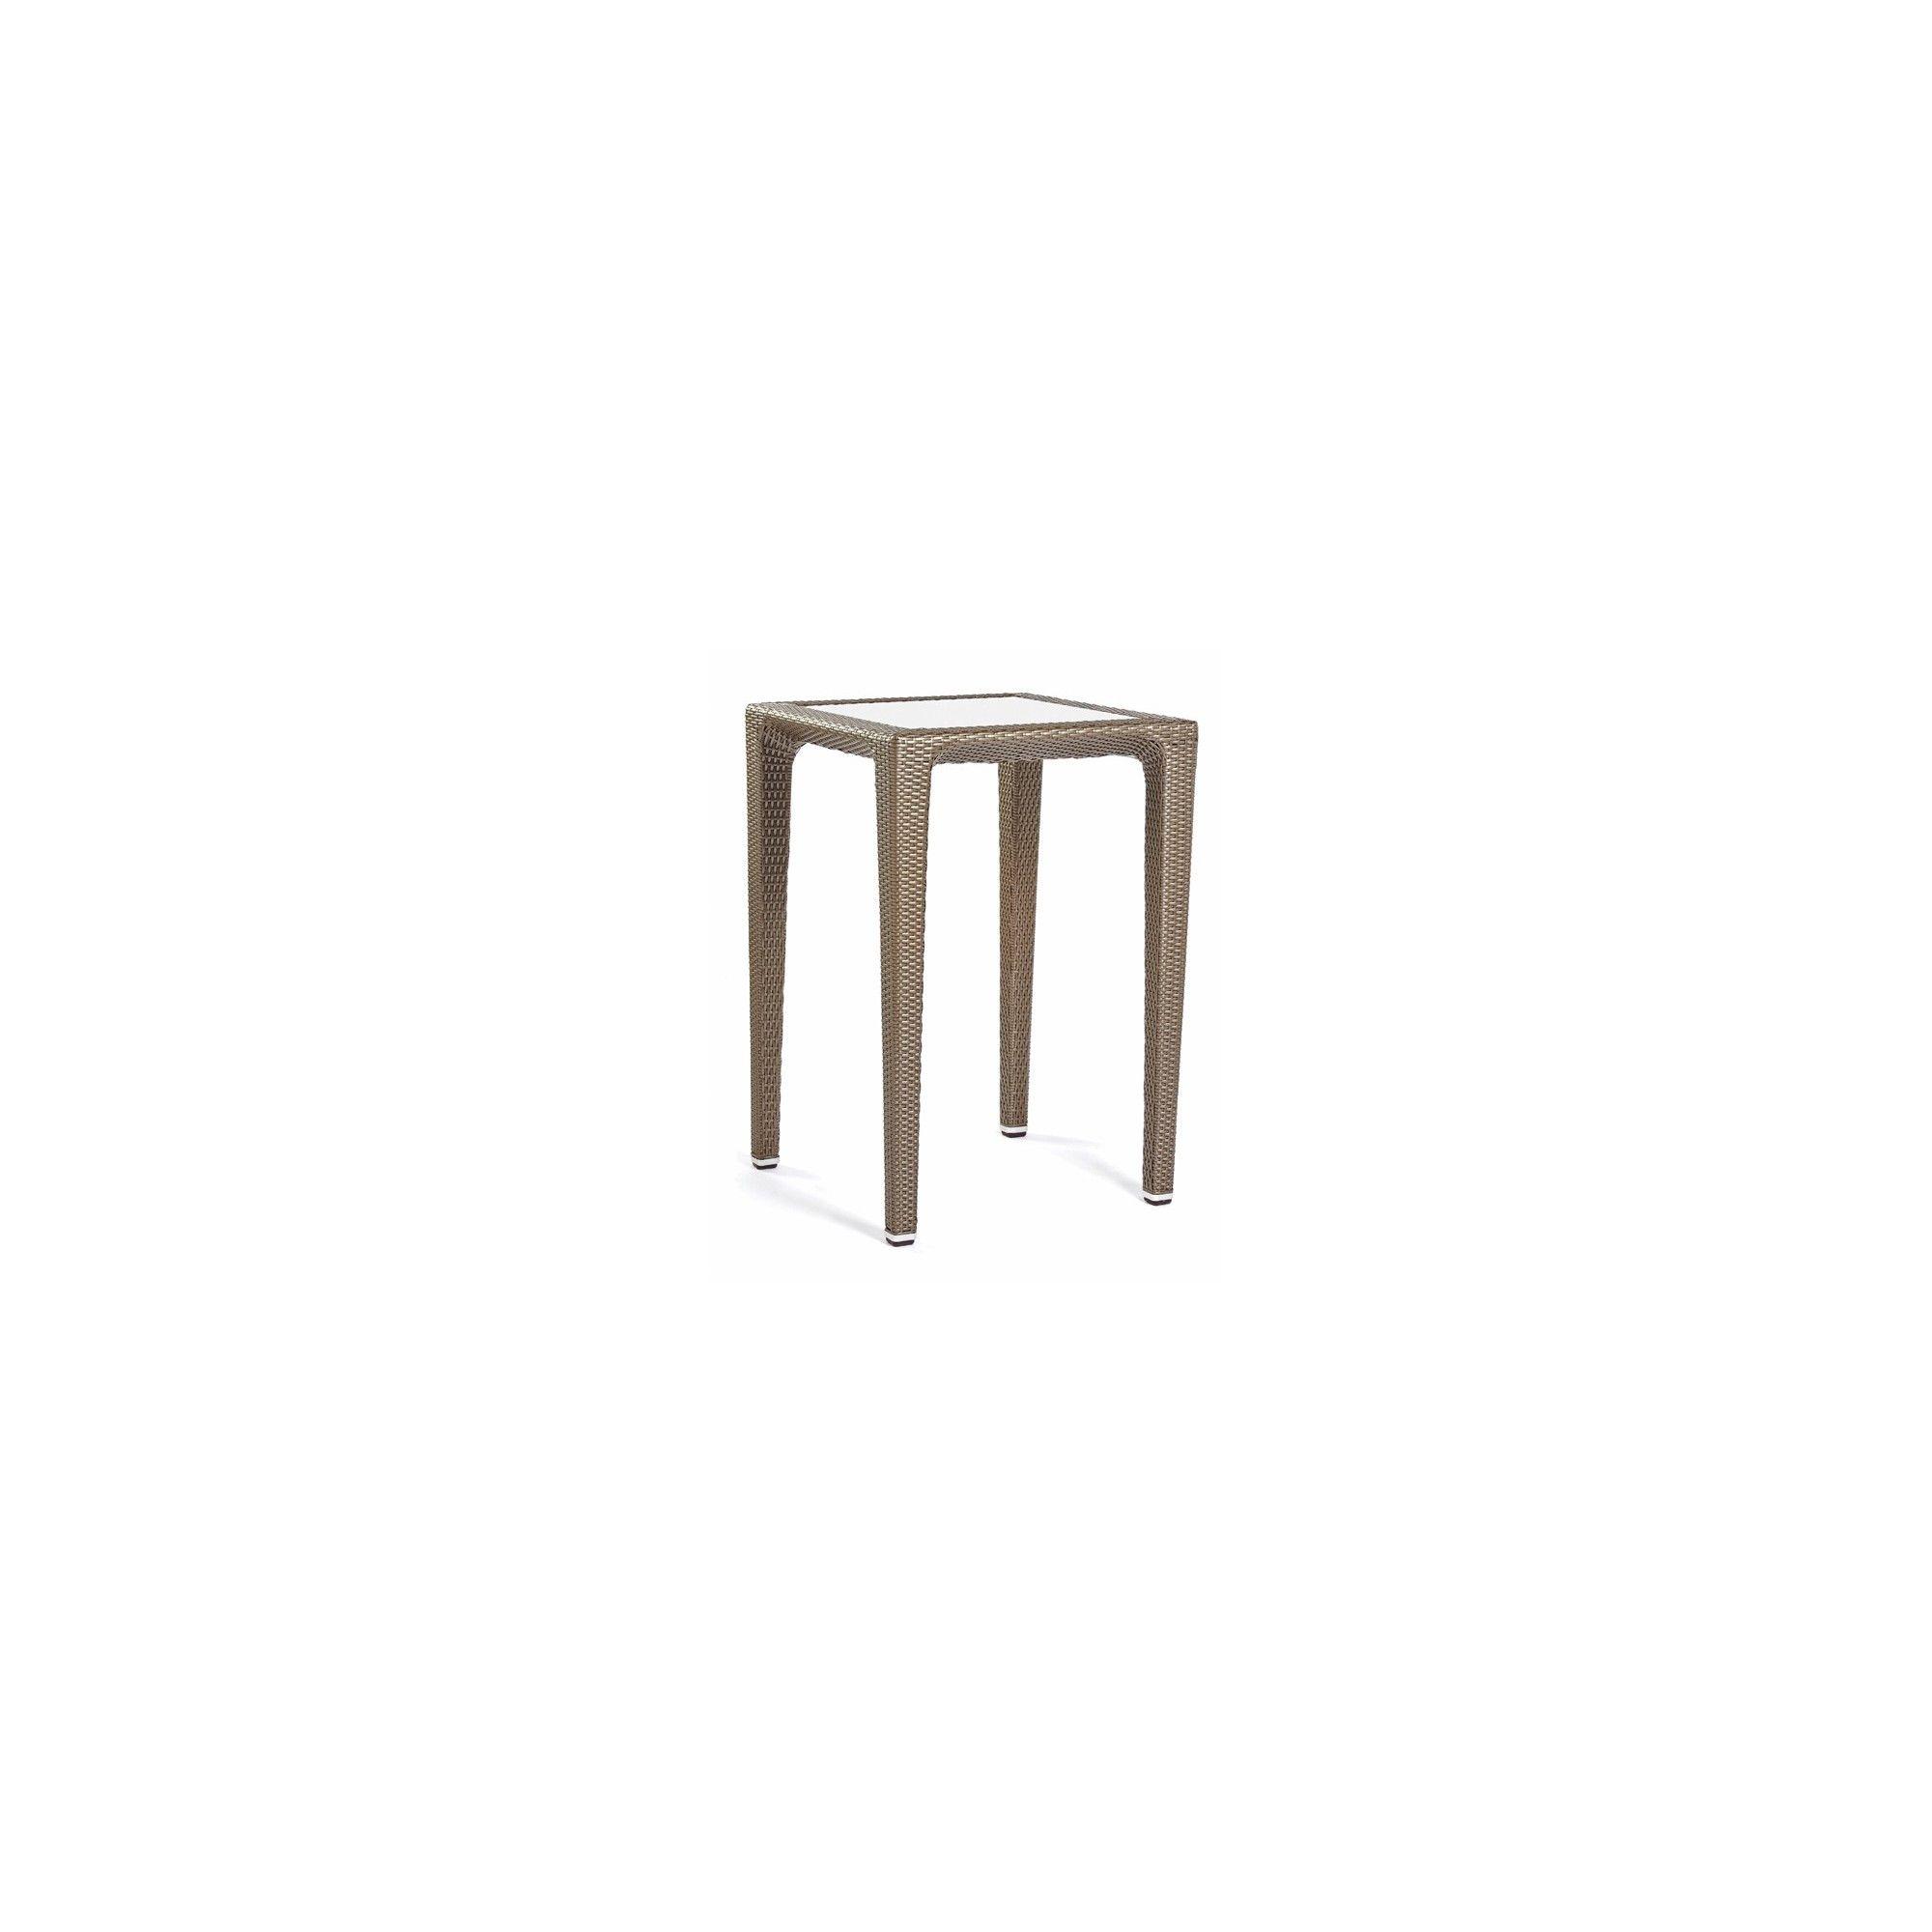 Varaschin Altea High Table by Varaschin R and D - Bronze at Tesco Direct